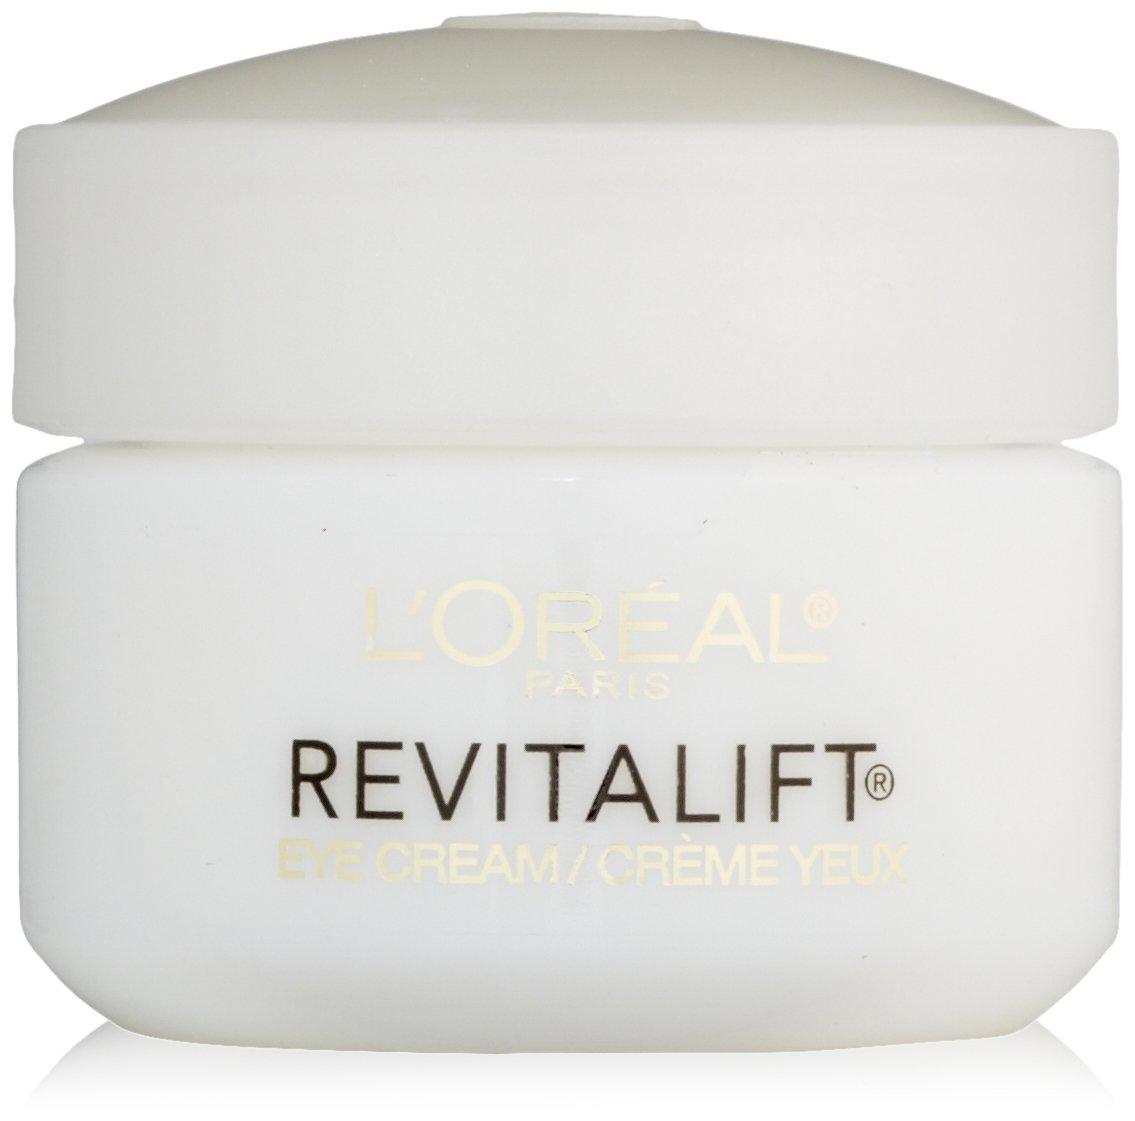 L'Oréal Paris Revitalift Anti-Wrinkle + Firming Eye Cream Treatment, 0.5 fl. oz.